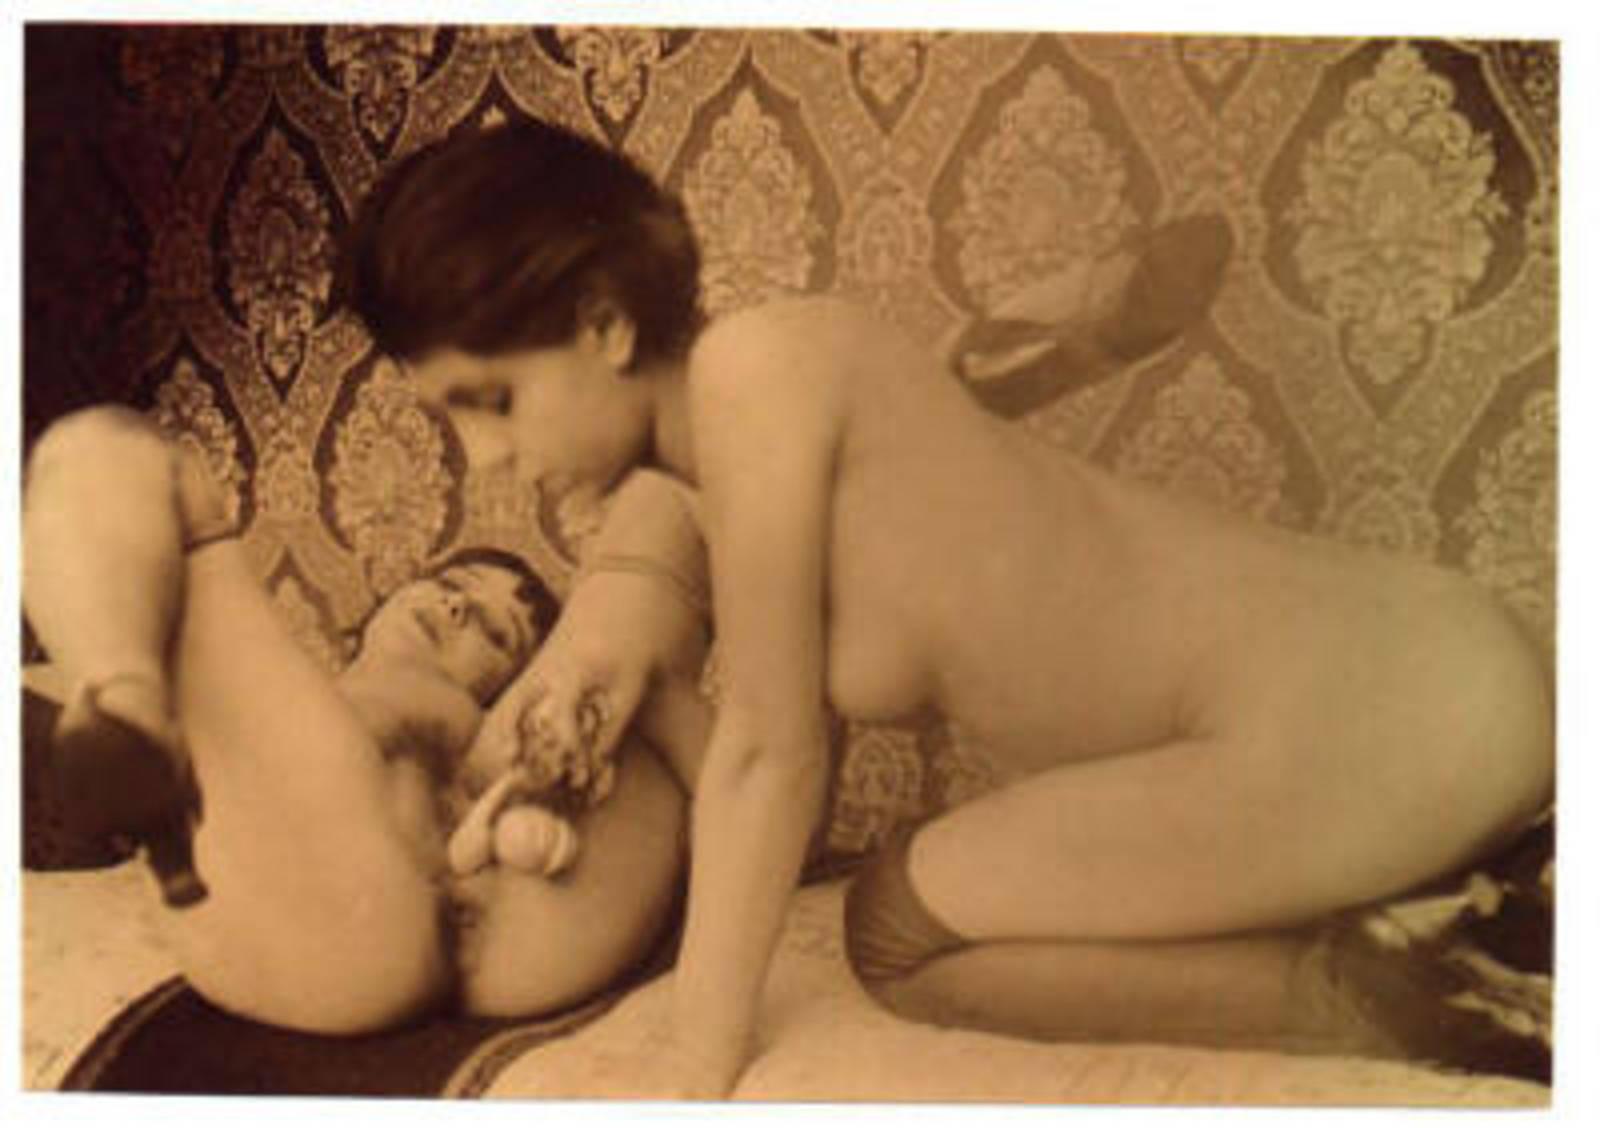 Супер эротика смотреть онлайн ретро 5 фотография